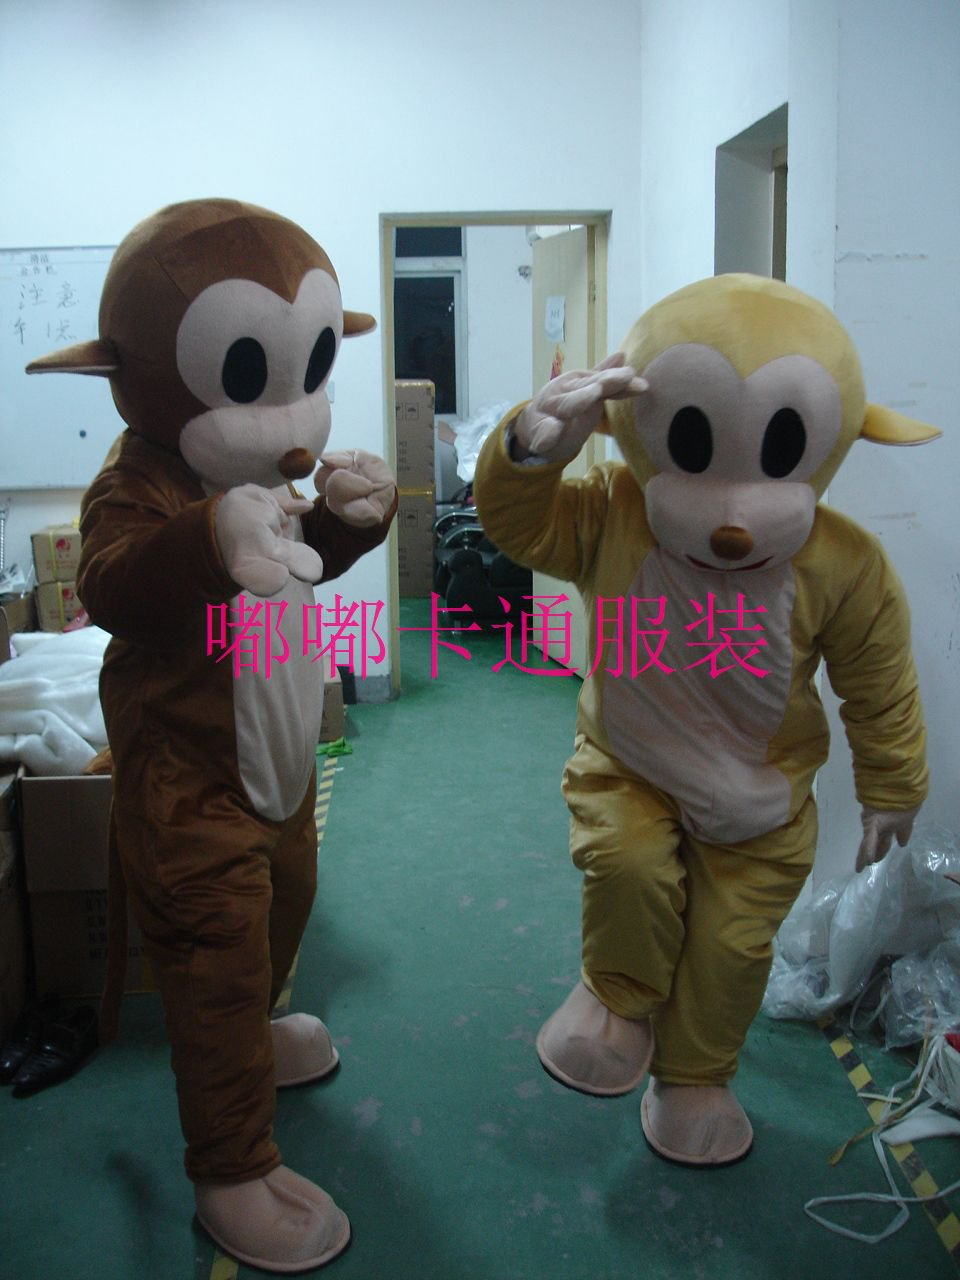 Walking Cartoon Doll Clothing Cartoon Costumes Jumping Monkey Dolls Mascot Costume